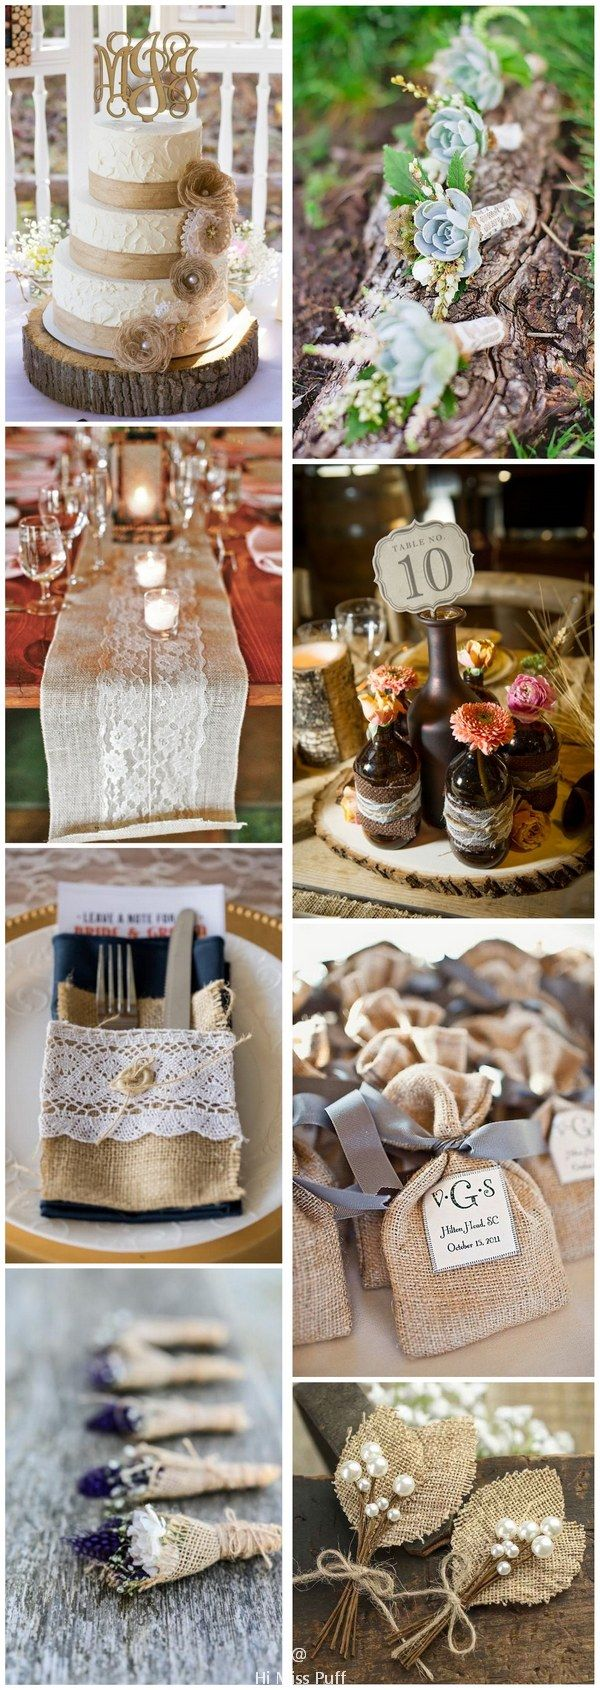 Rustic country burlap and lace wedding ideas #weddings #weddingideas